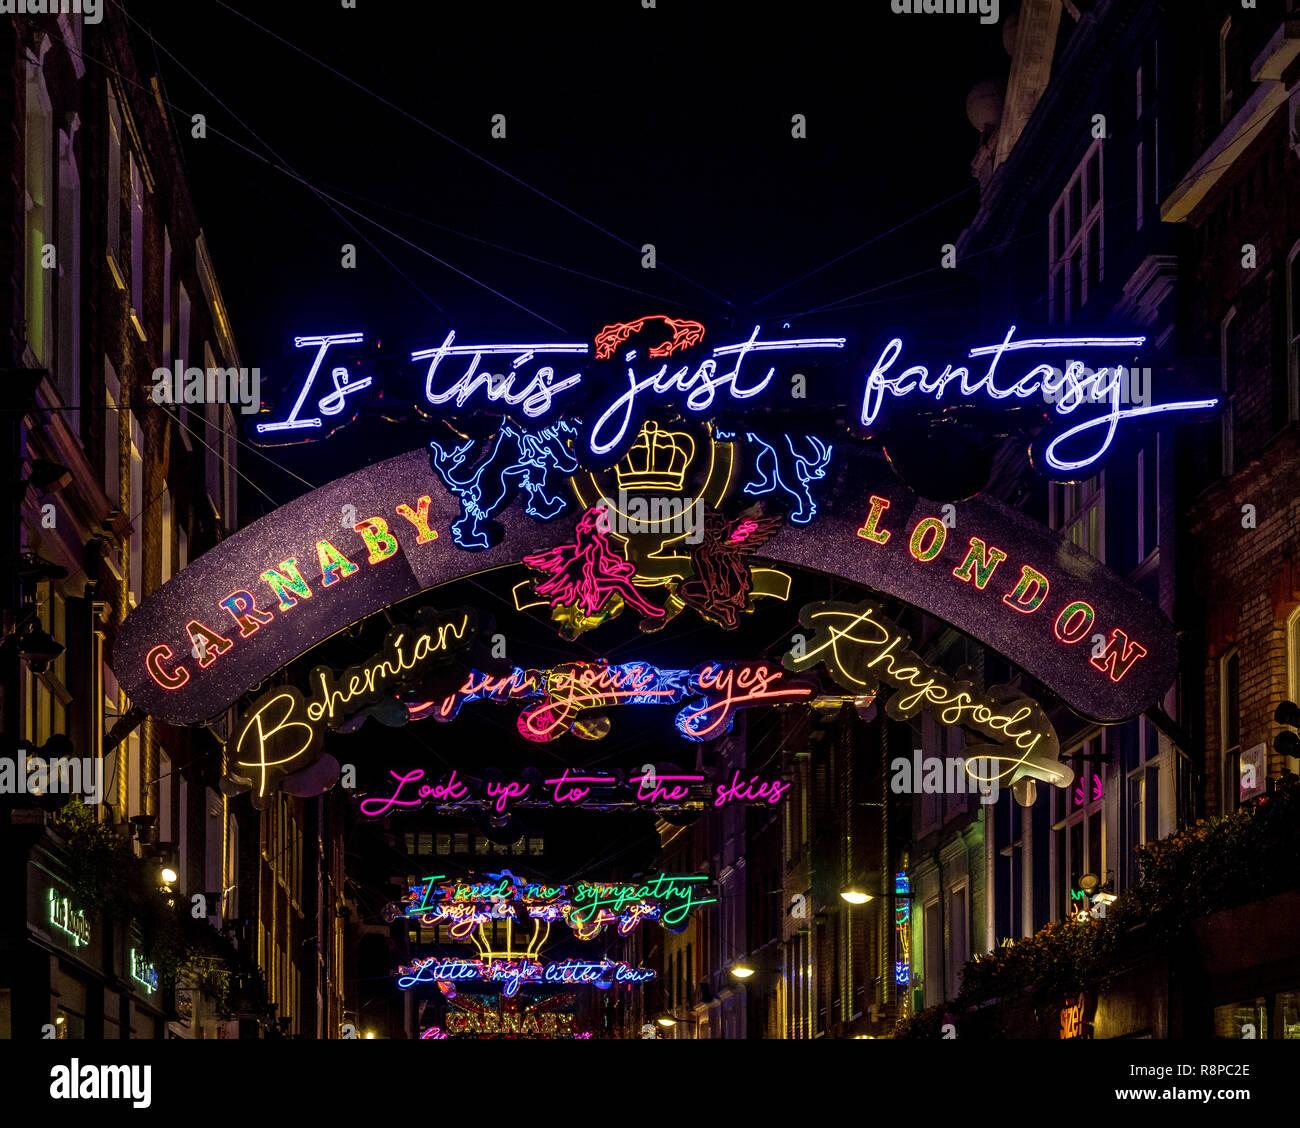 Carnaby Street christmas illuminations based on Bohemian Rhapsody lryics by Queen, London, UK. - Stock Image